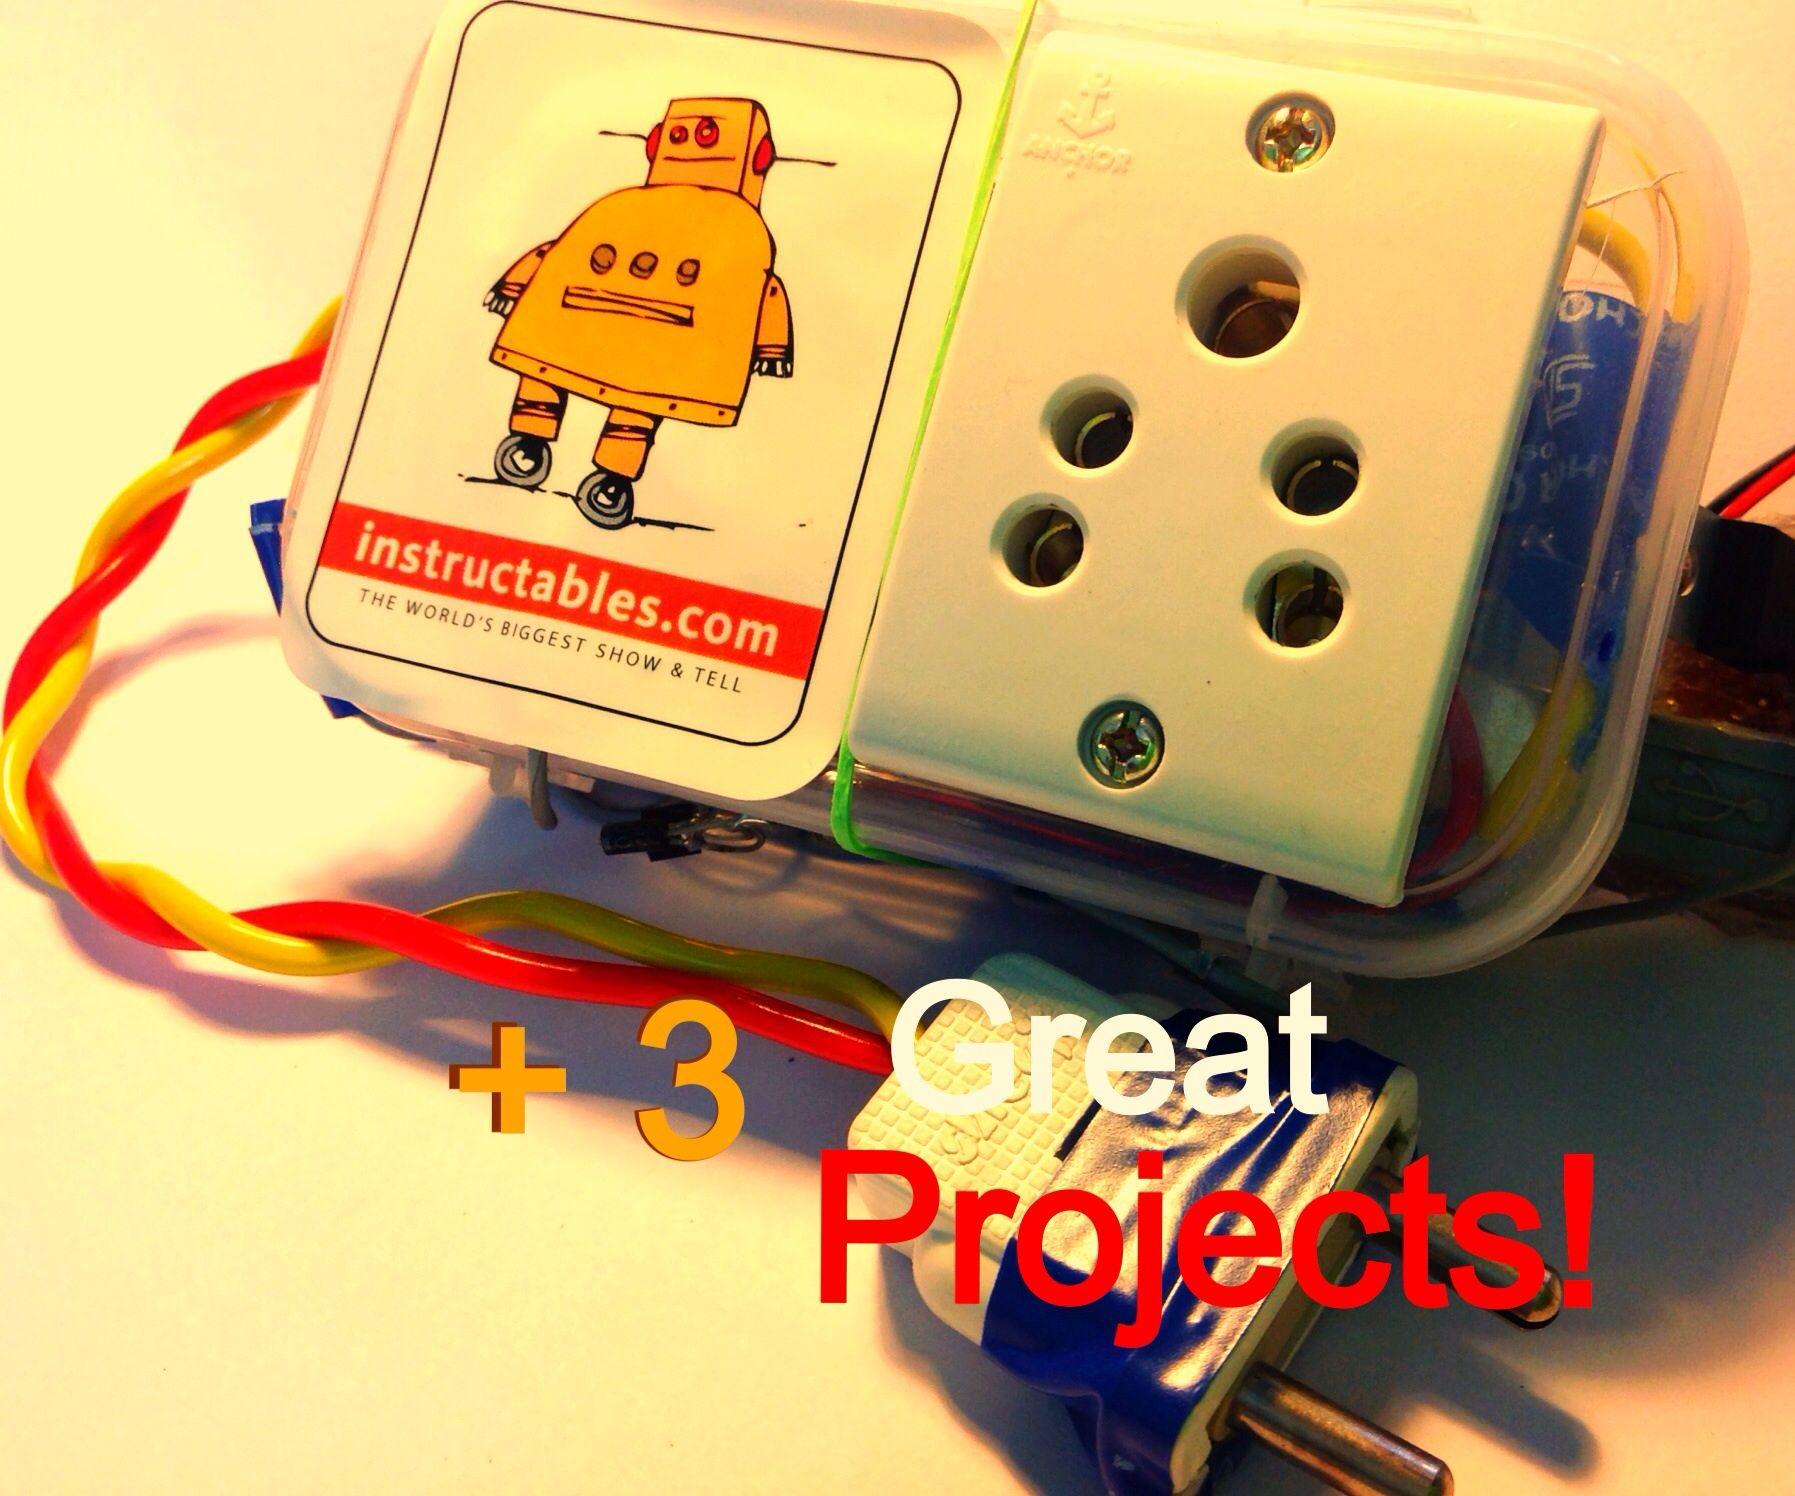 arduino tutorial capacitive touch sensors 21 steps (with pictures)arduino tutorial capacitive touch sensors